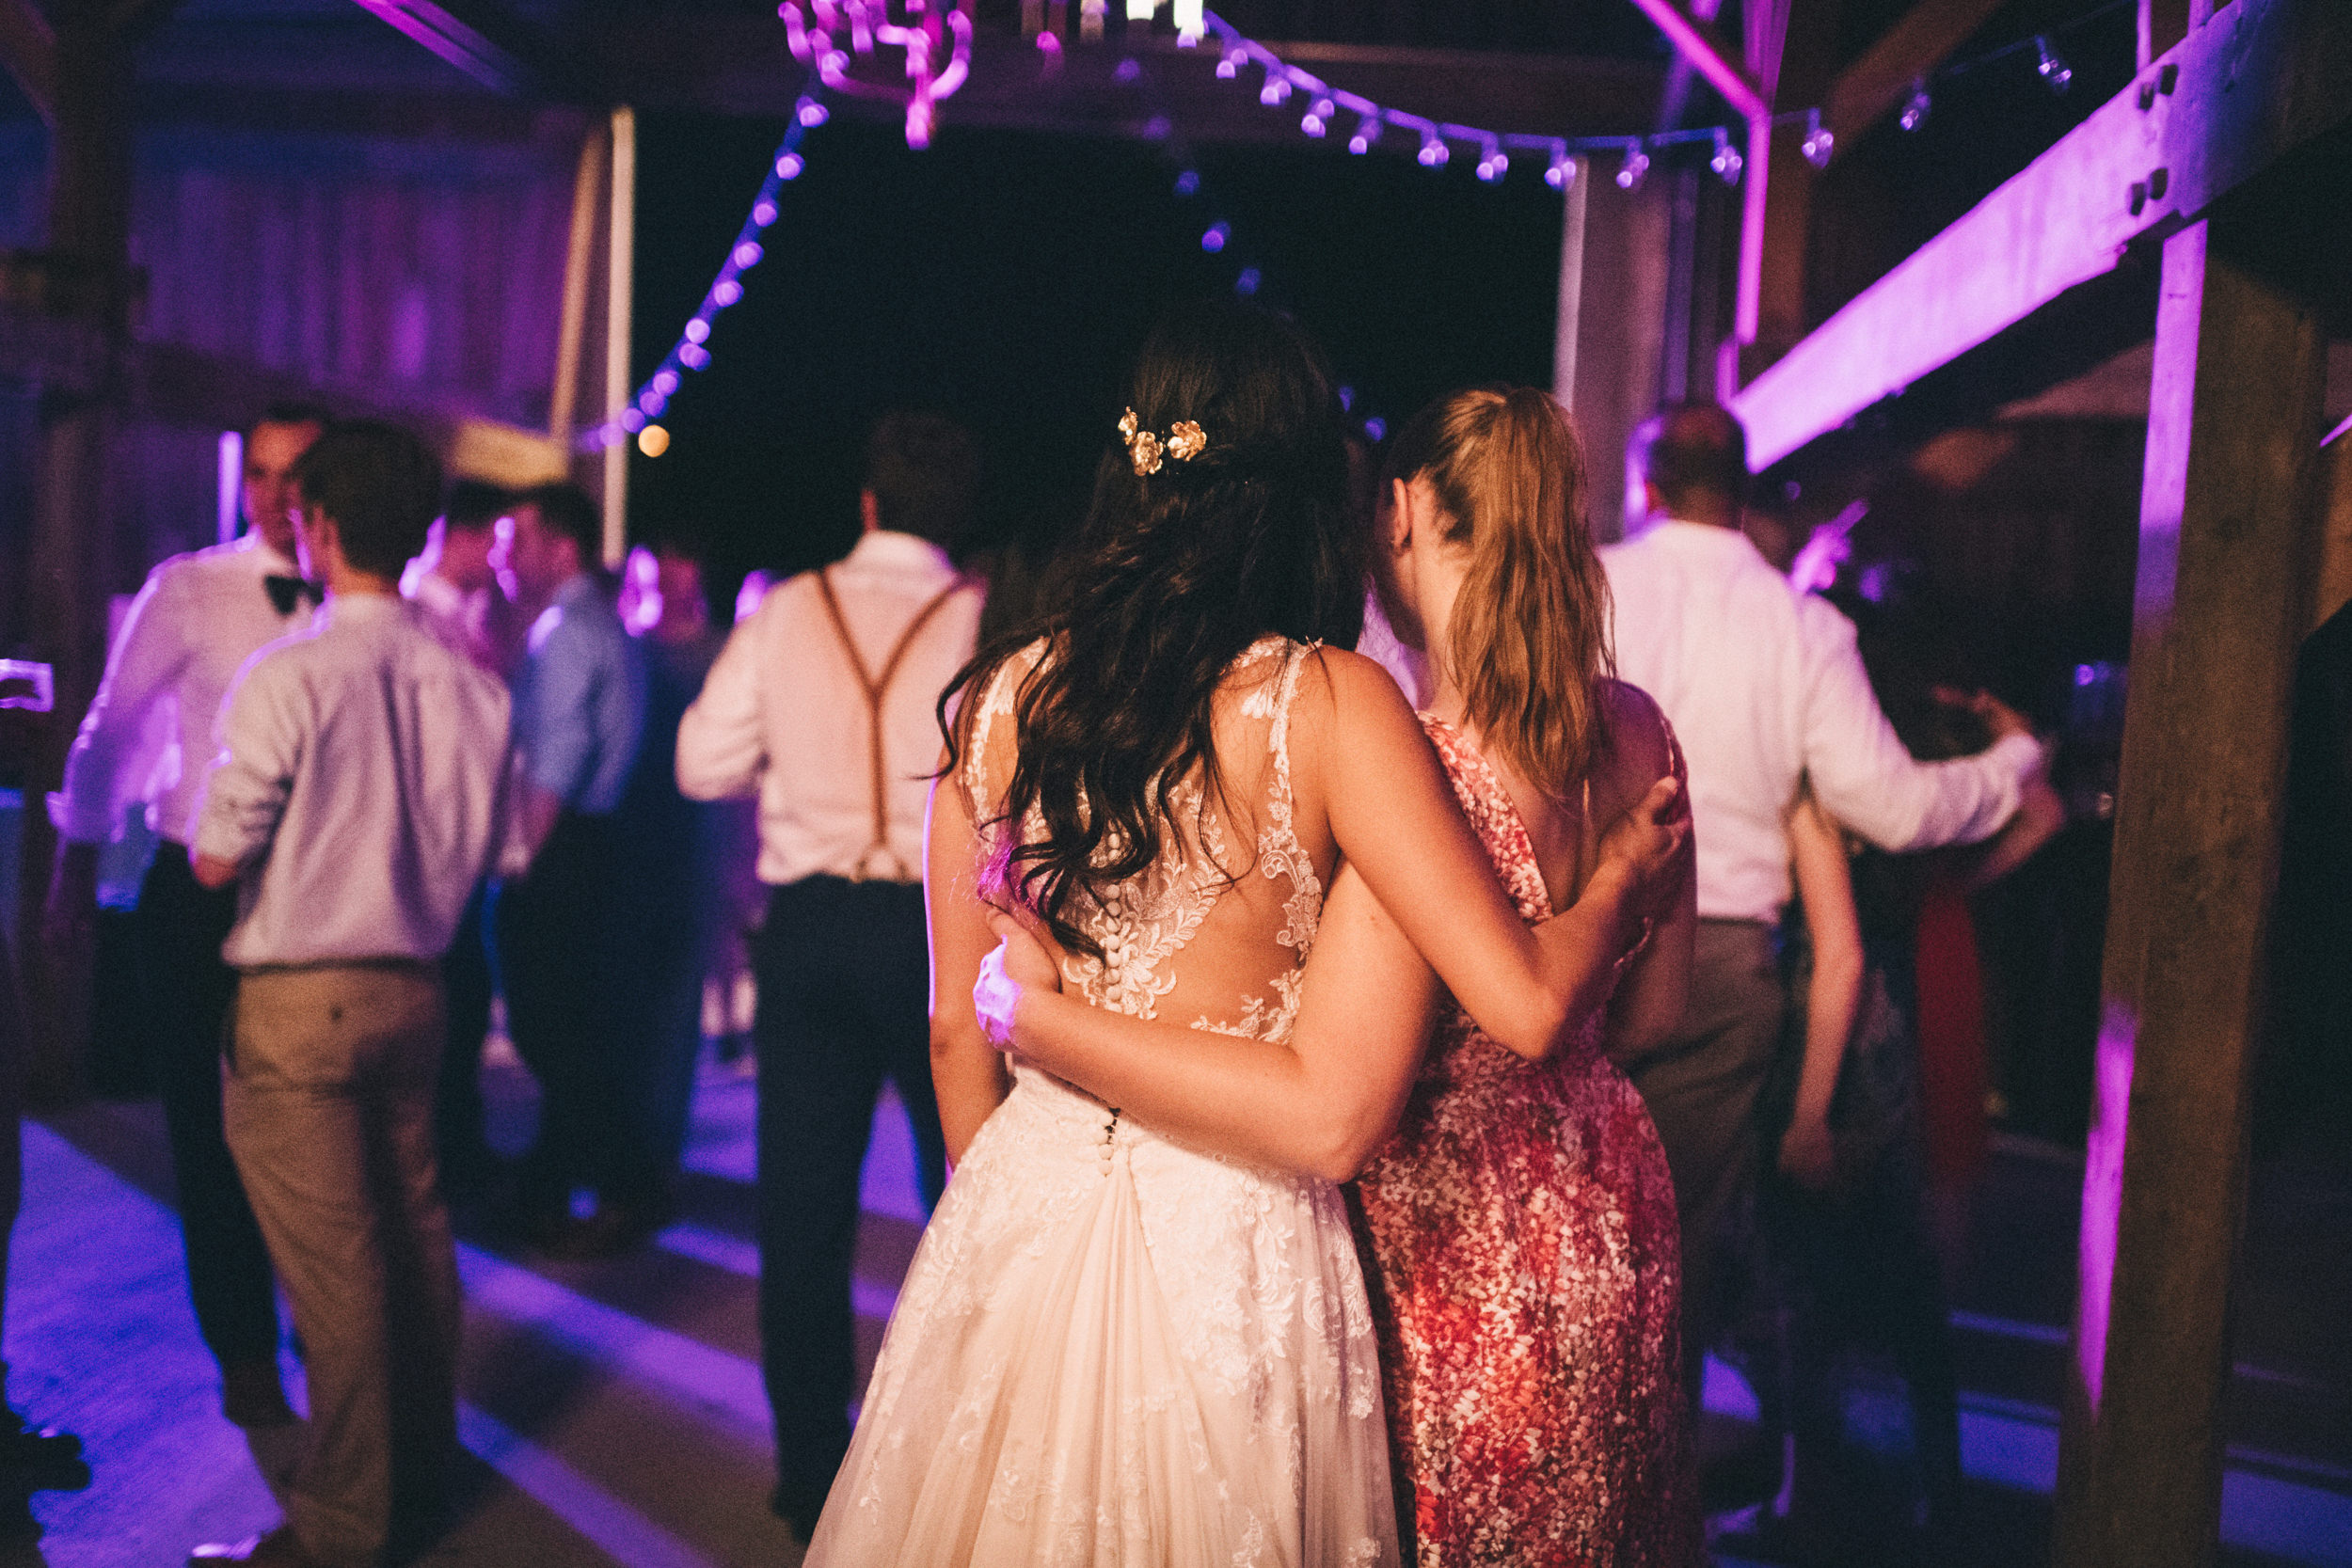 Louisville-Kentucky-Wedding-and-Elopement-Photographer-Sarah-Katherine-Davis-Photography-Summer-Jewel-Toned-Wedding-Chineese-Tea-Ceremony-Warrenwood-Manor-Danville-1095.jpg